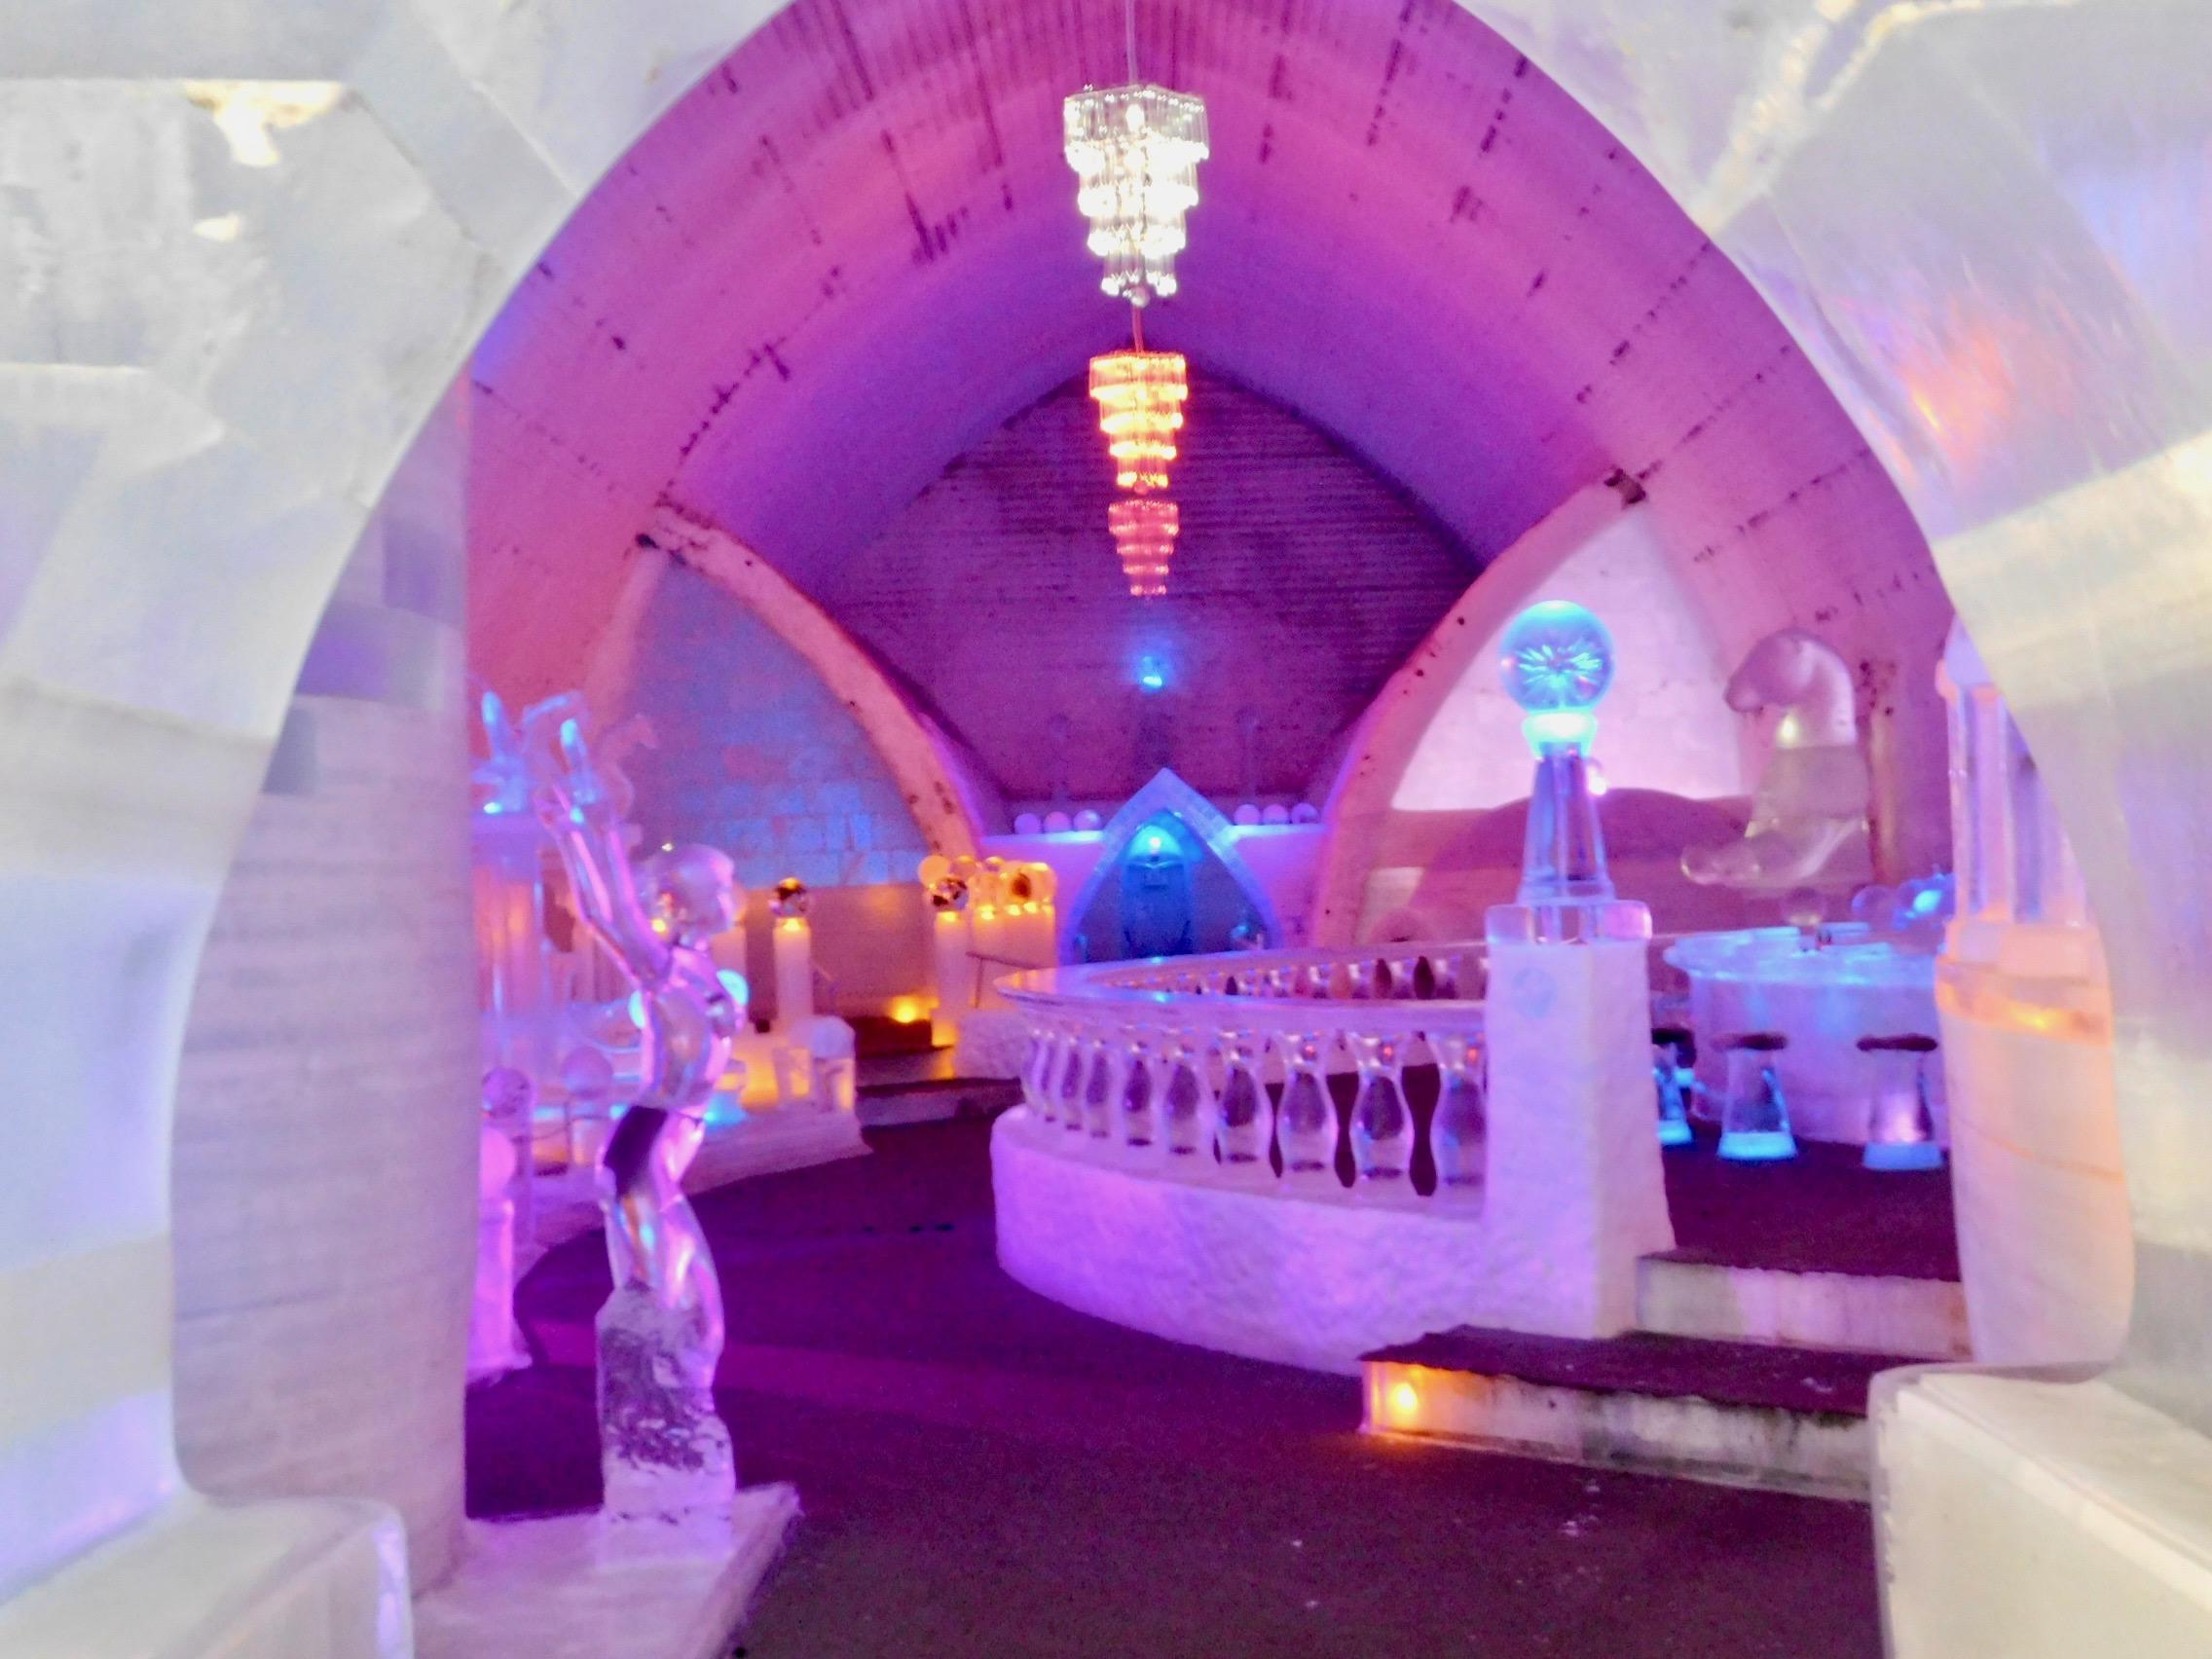 Aurora Ice Museum Gallery by Denise Ferree